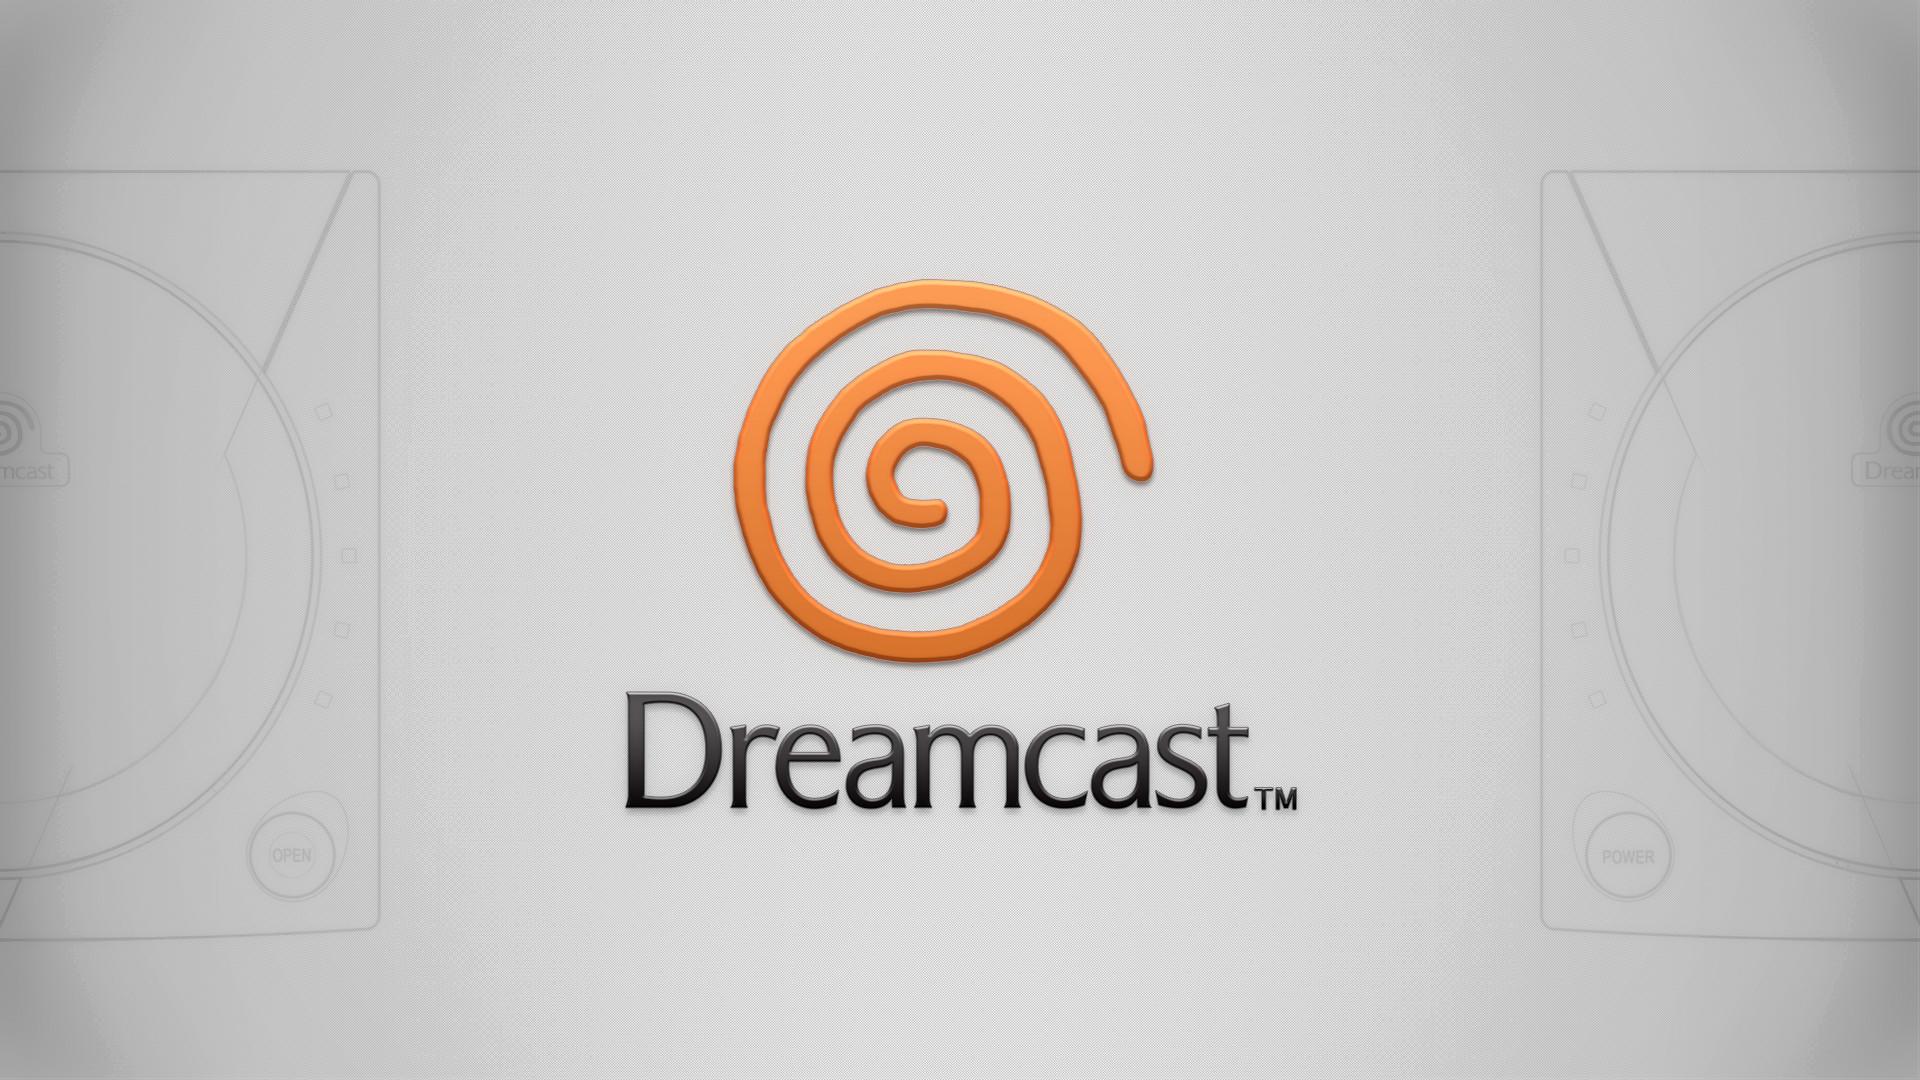 Sega Dreamcast Wallpaper by BLUEamnesiac Sega Dreamcast Wallpaper by  BLUEamnesiac